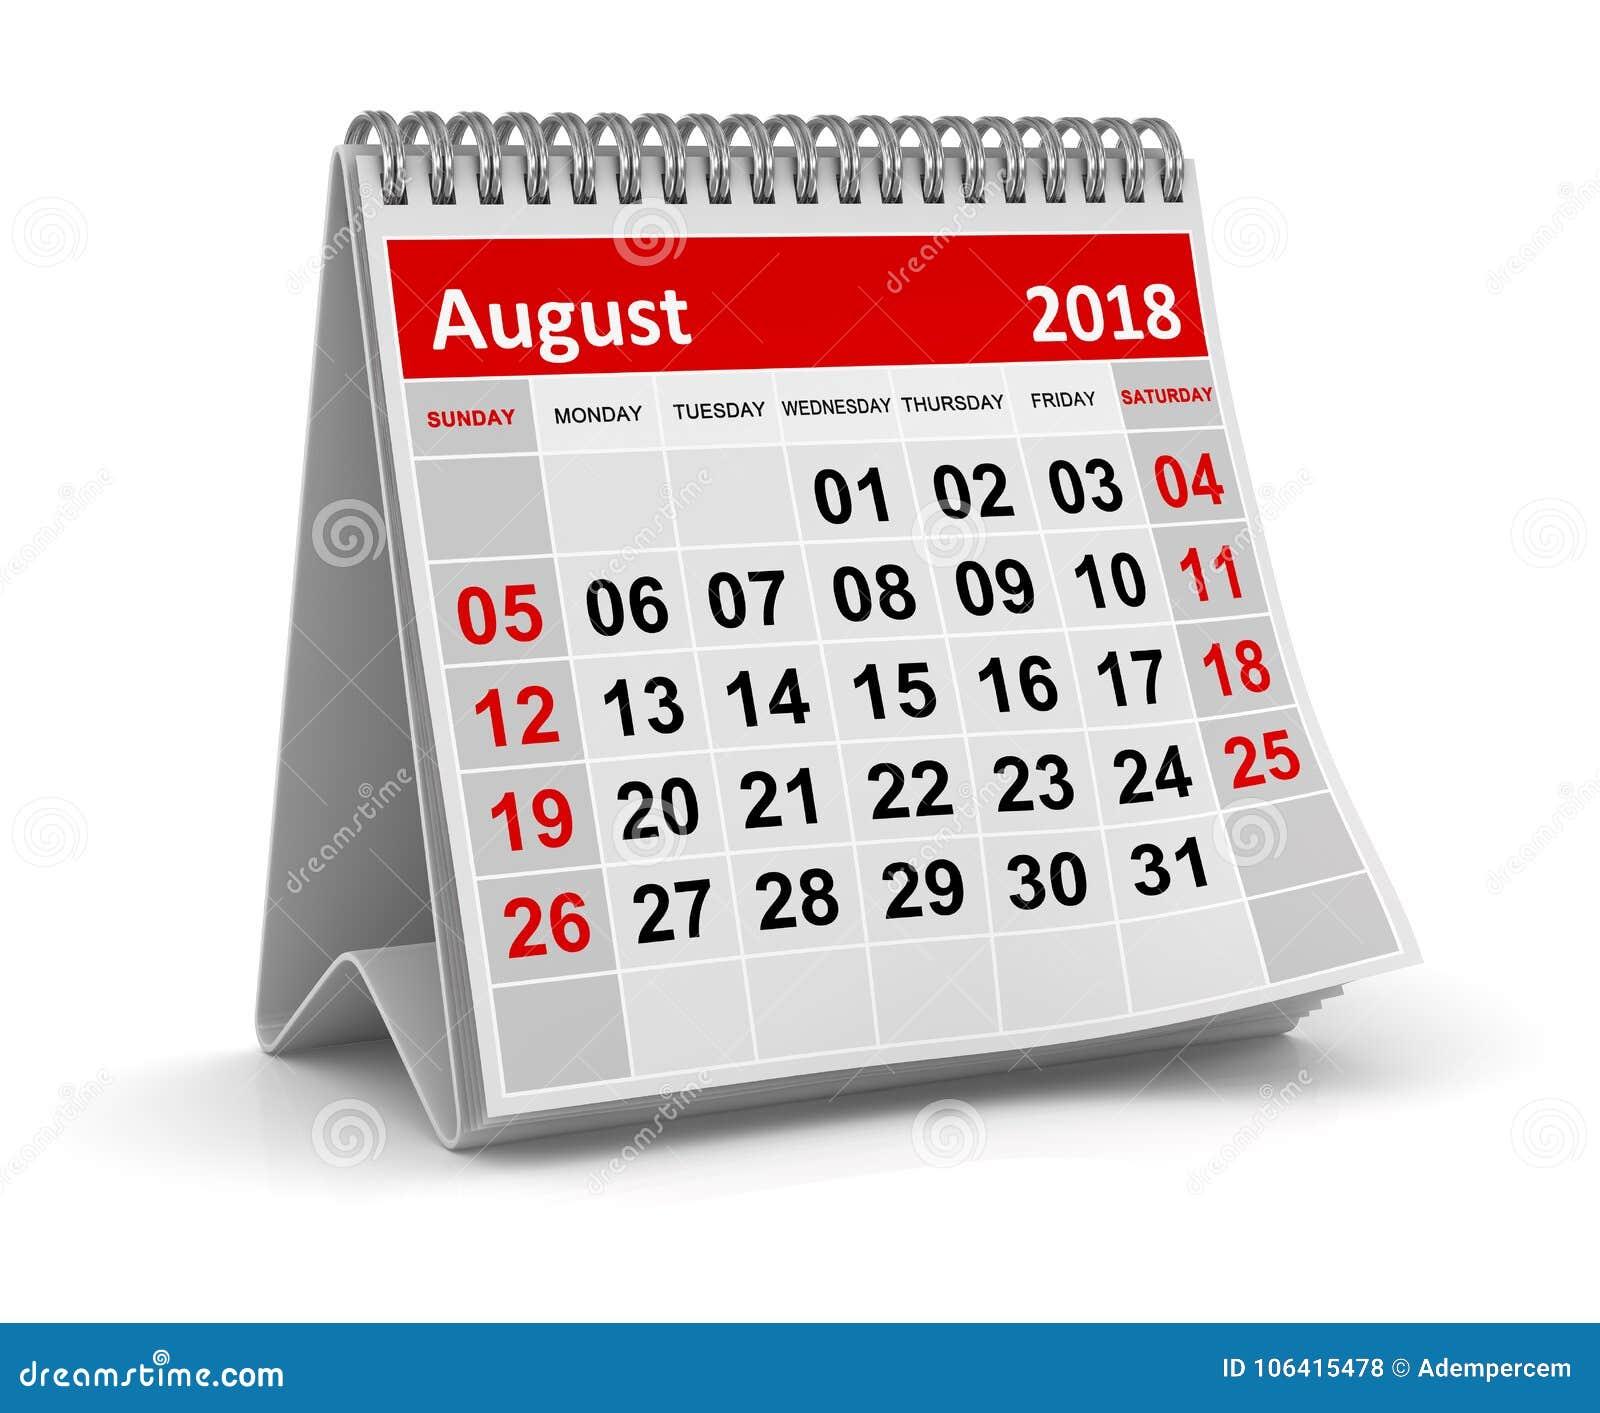 Augusti 2018 - kalender